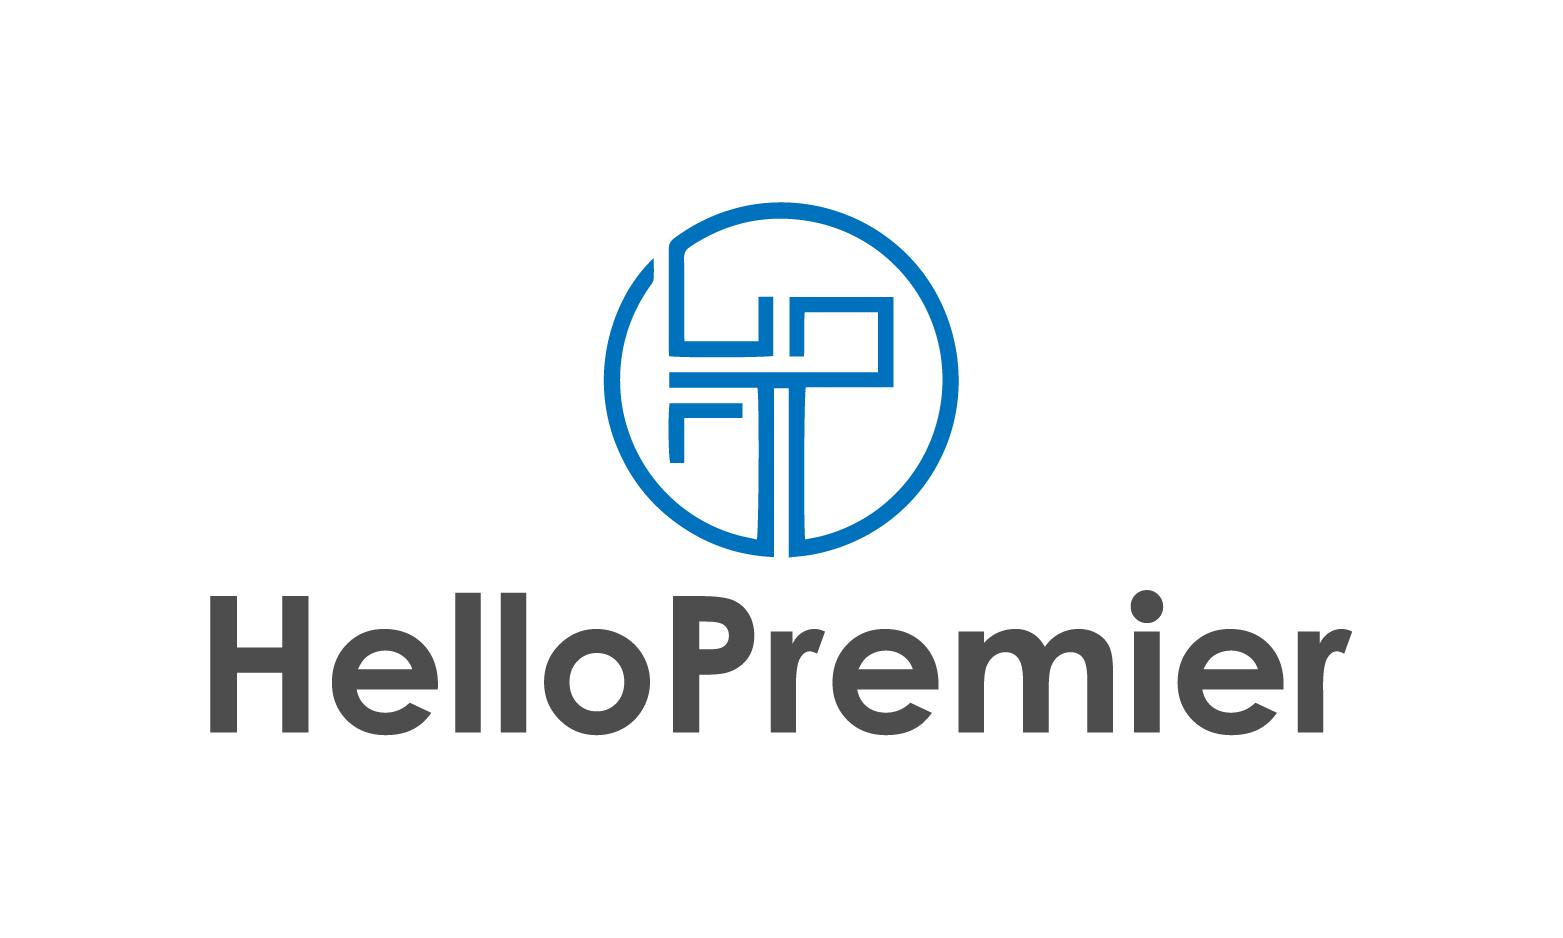 HelloPremier.com